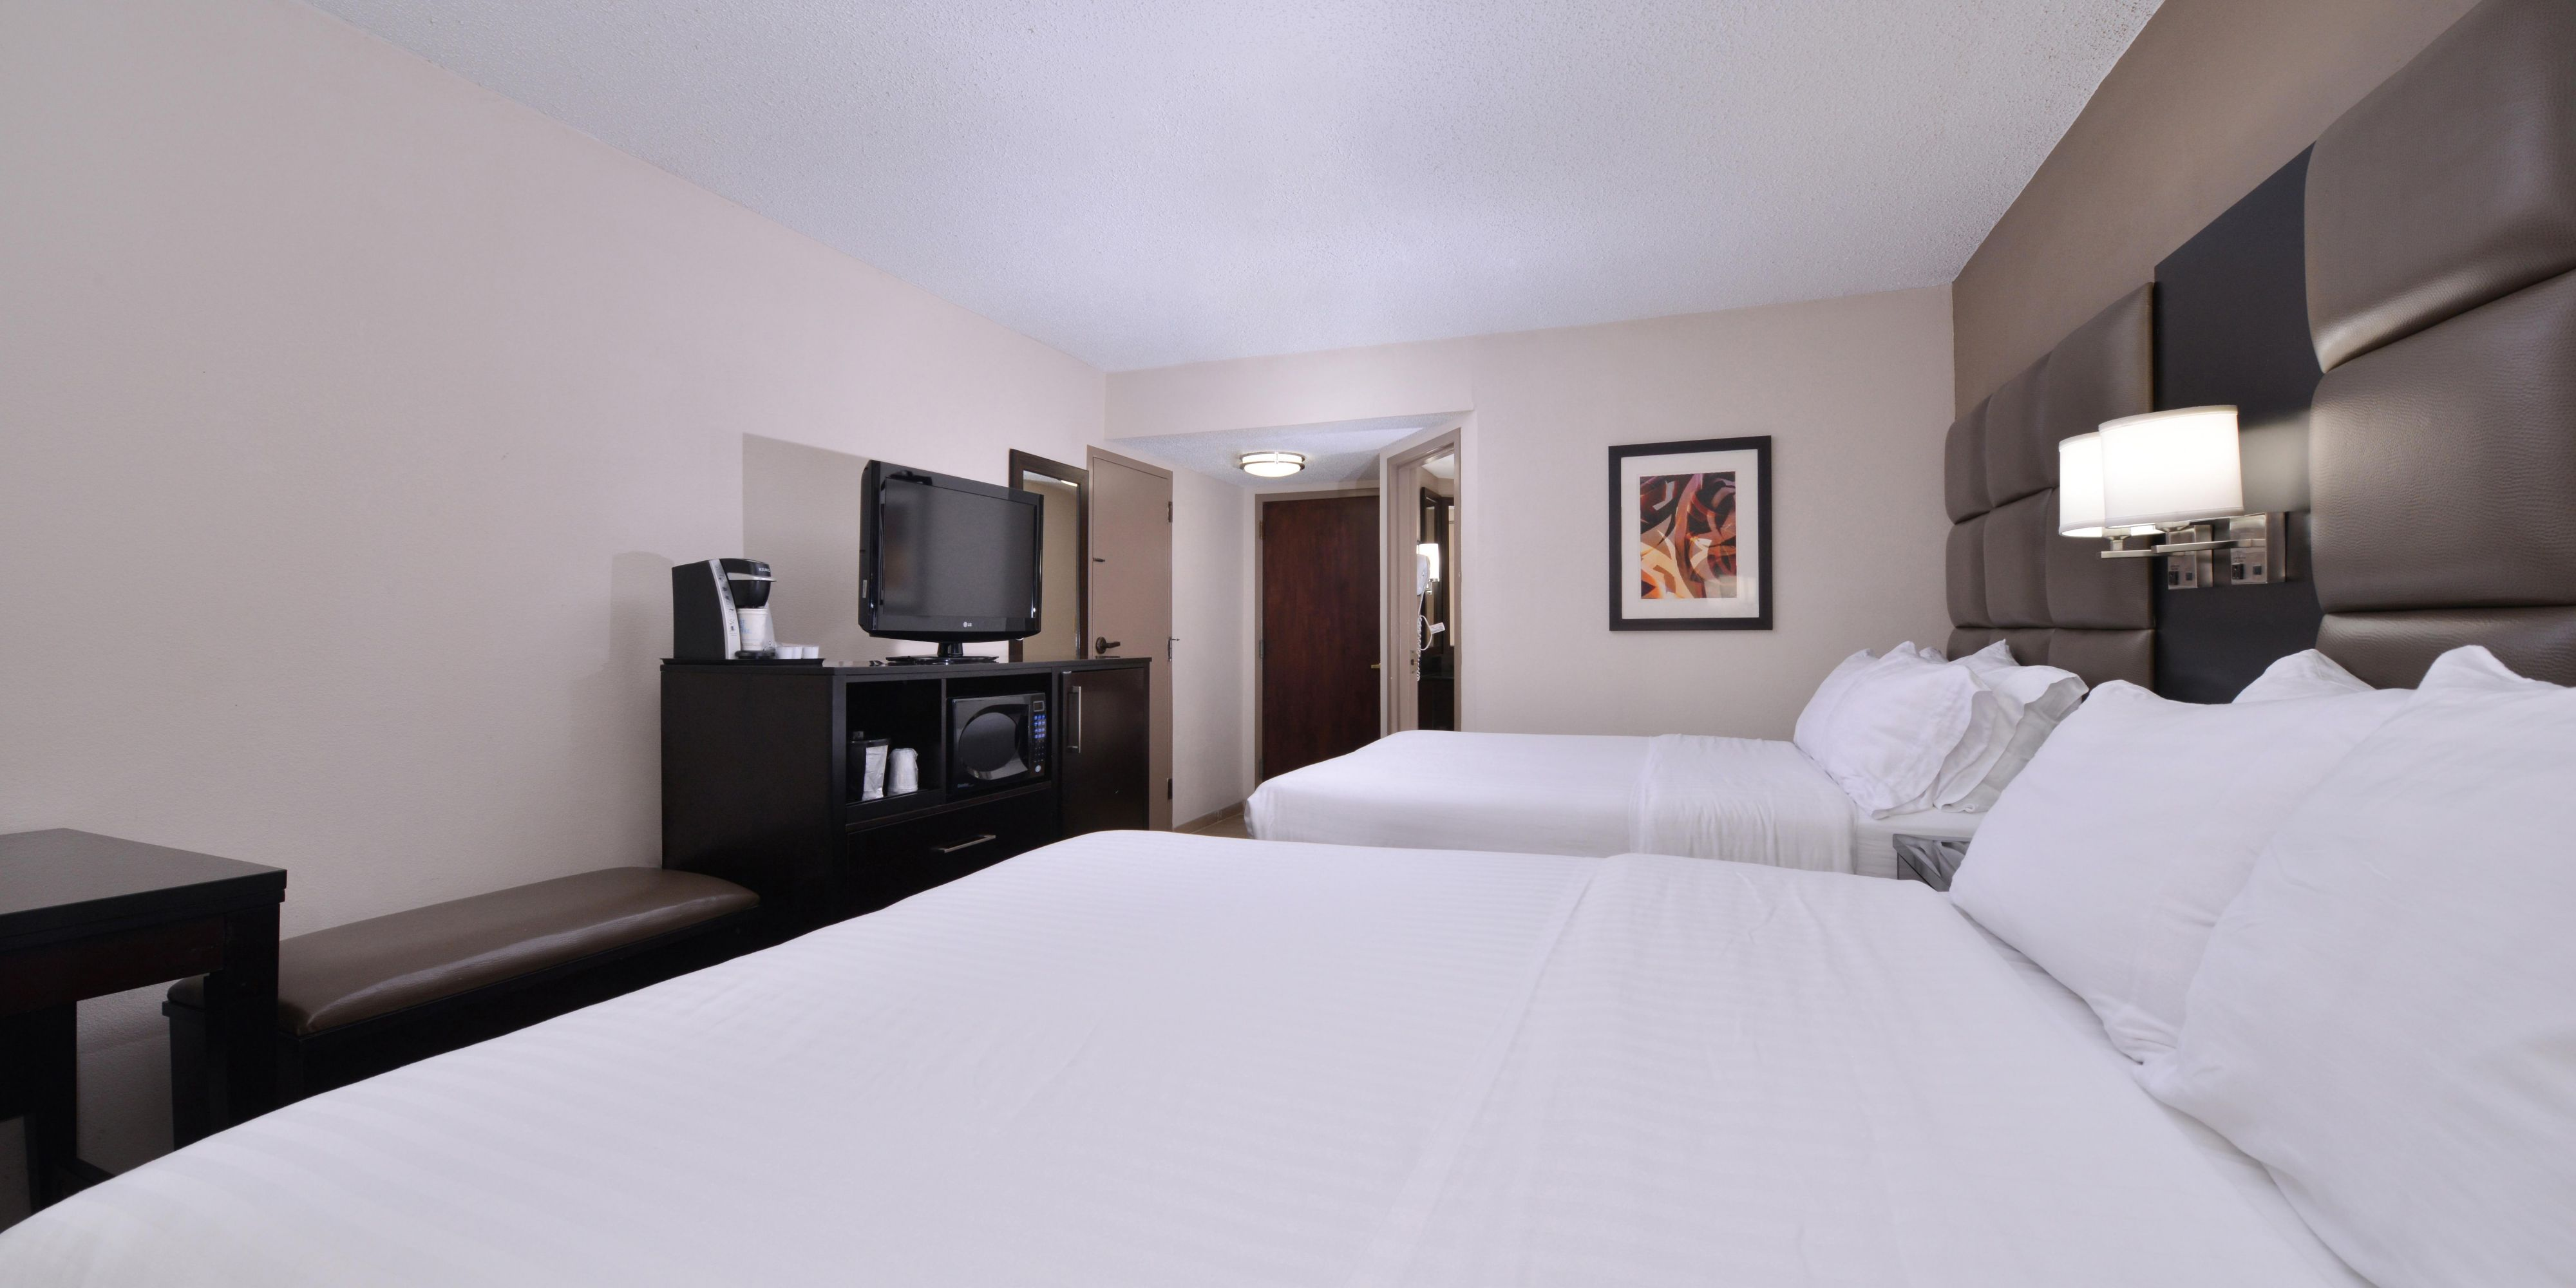 Holiday Inn Express Burlington Hotel by IHG